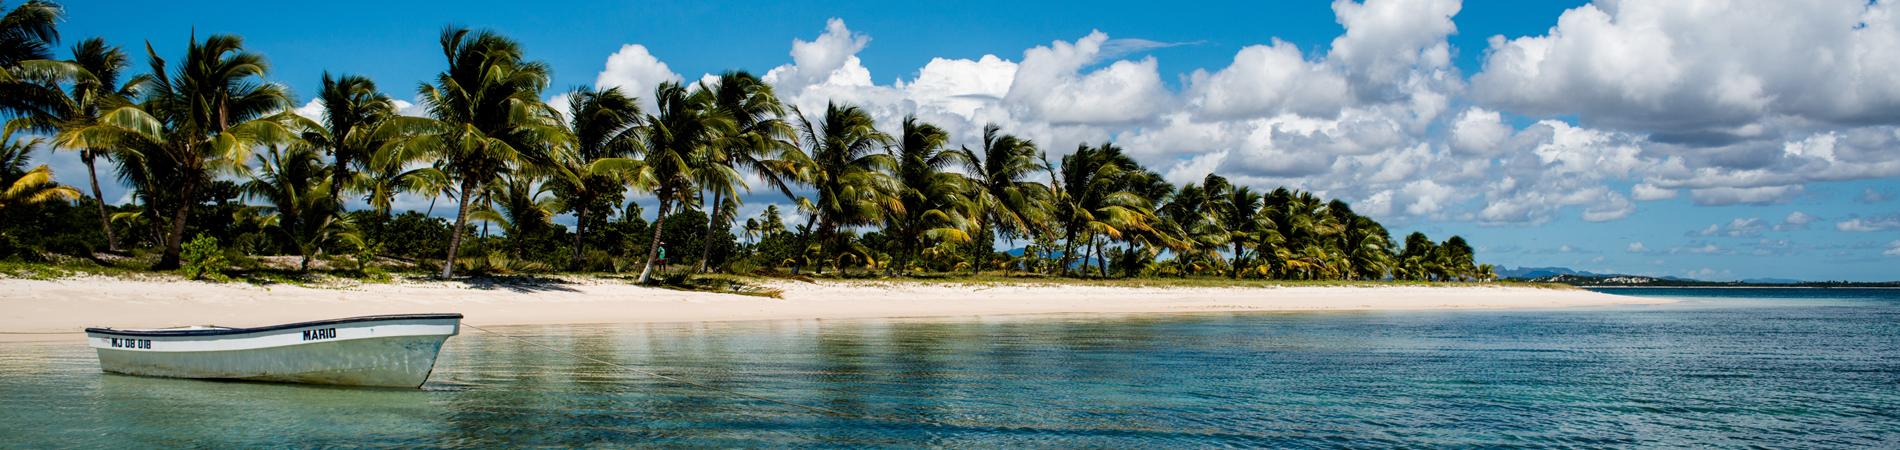 miavana beach2 header website